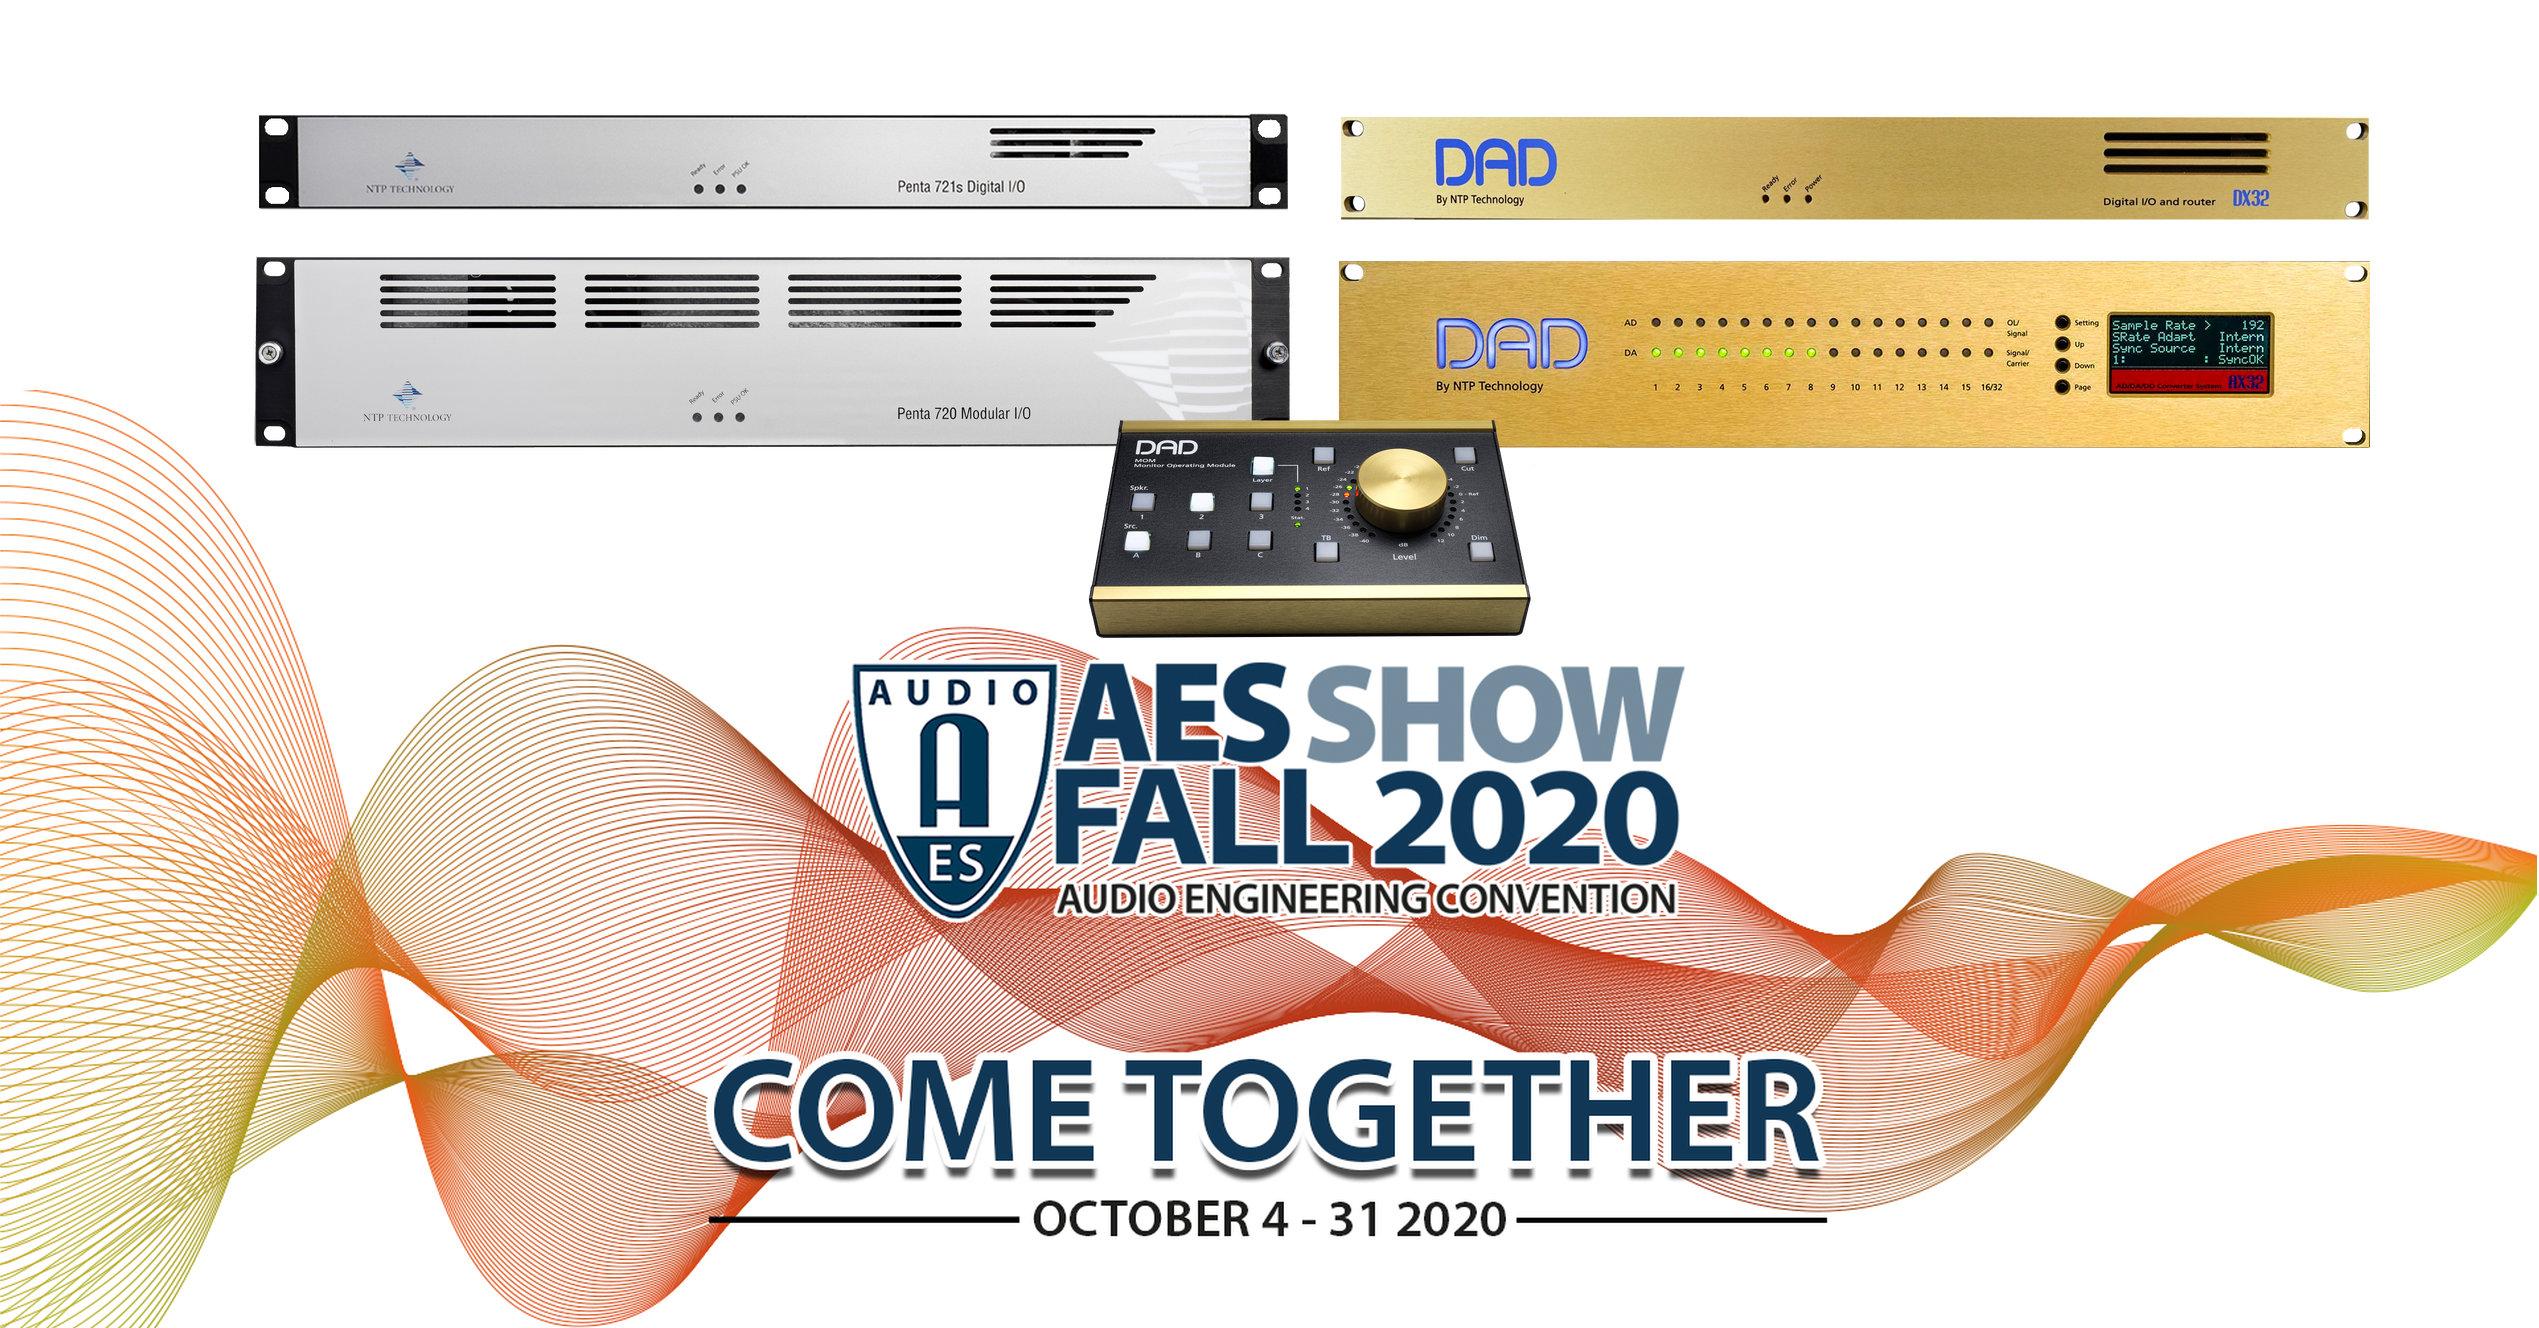 NTP & DAD at AES Fall 2020